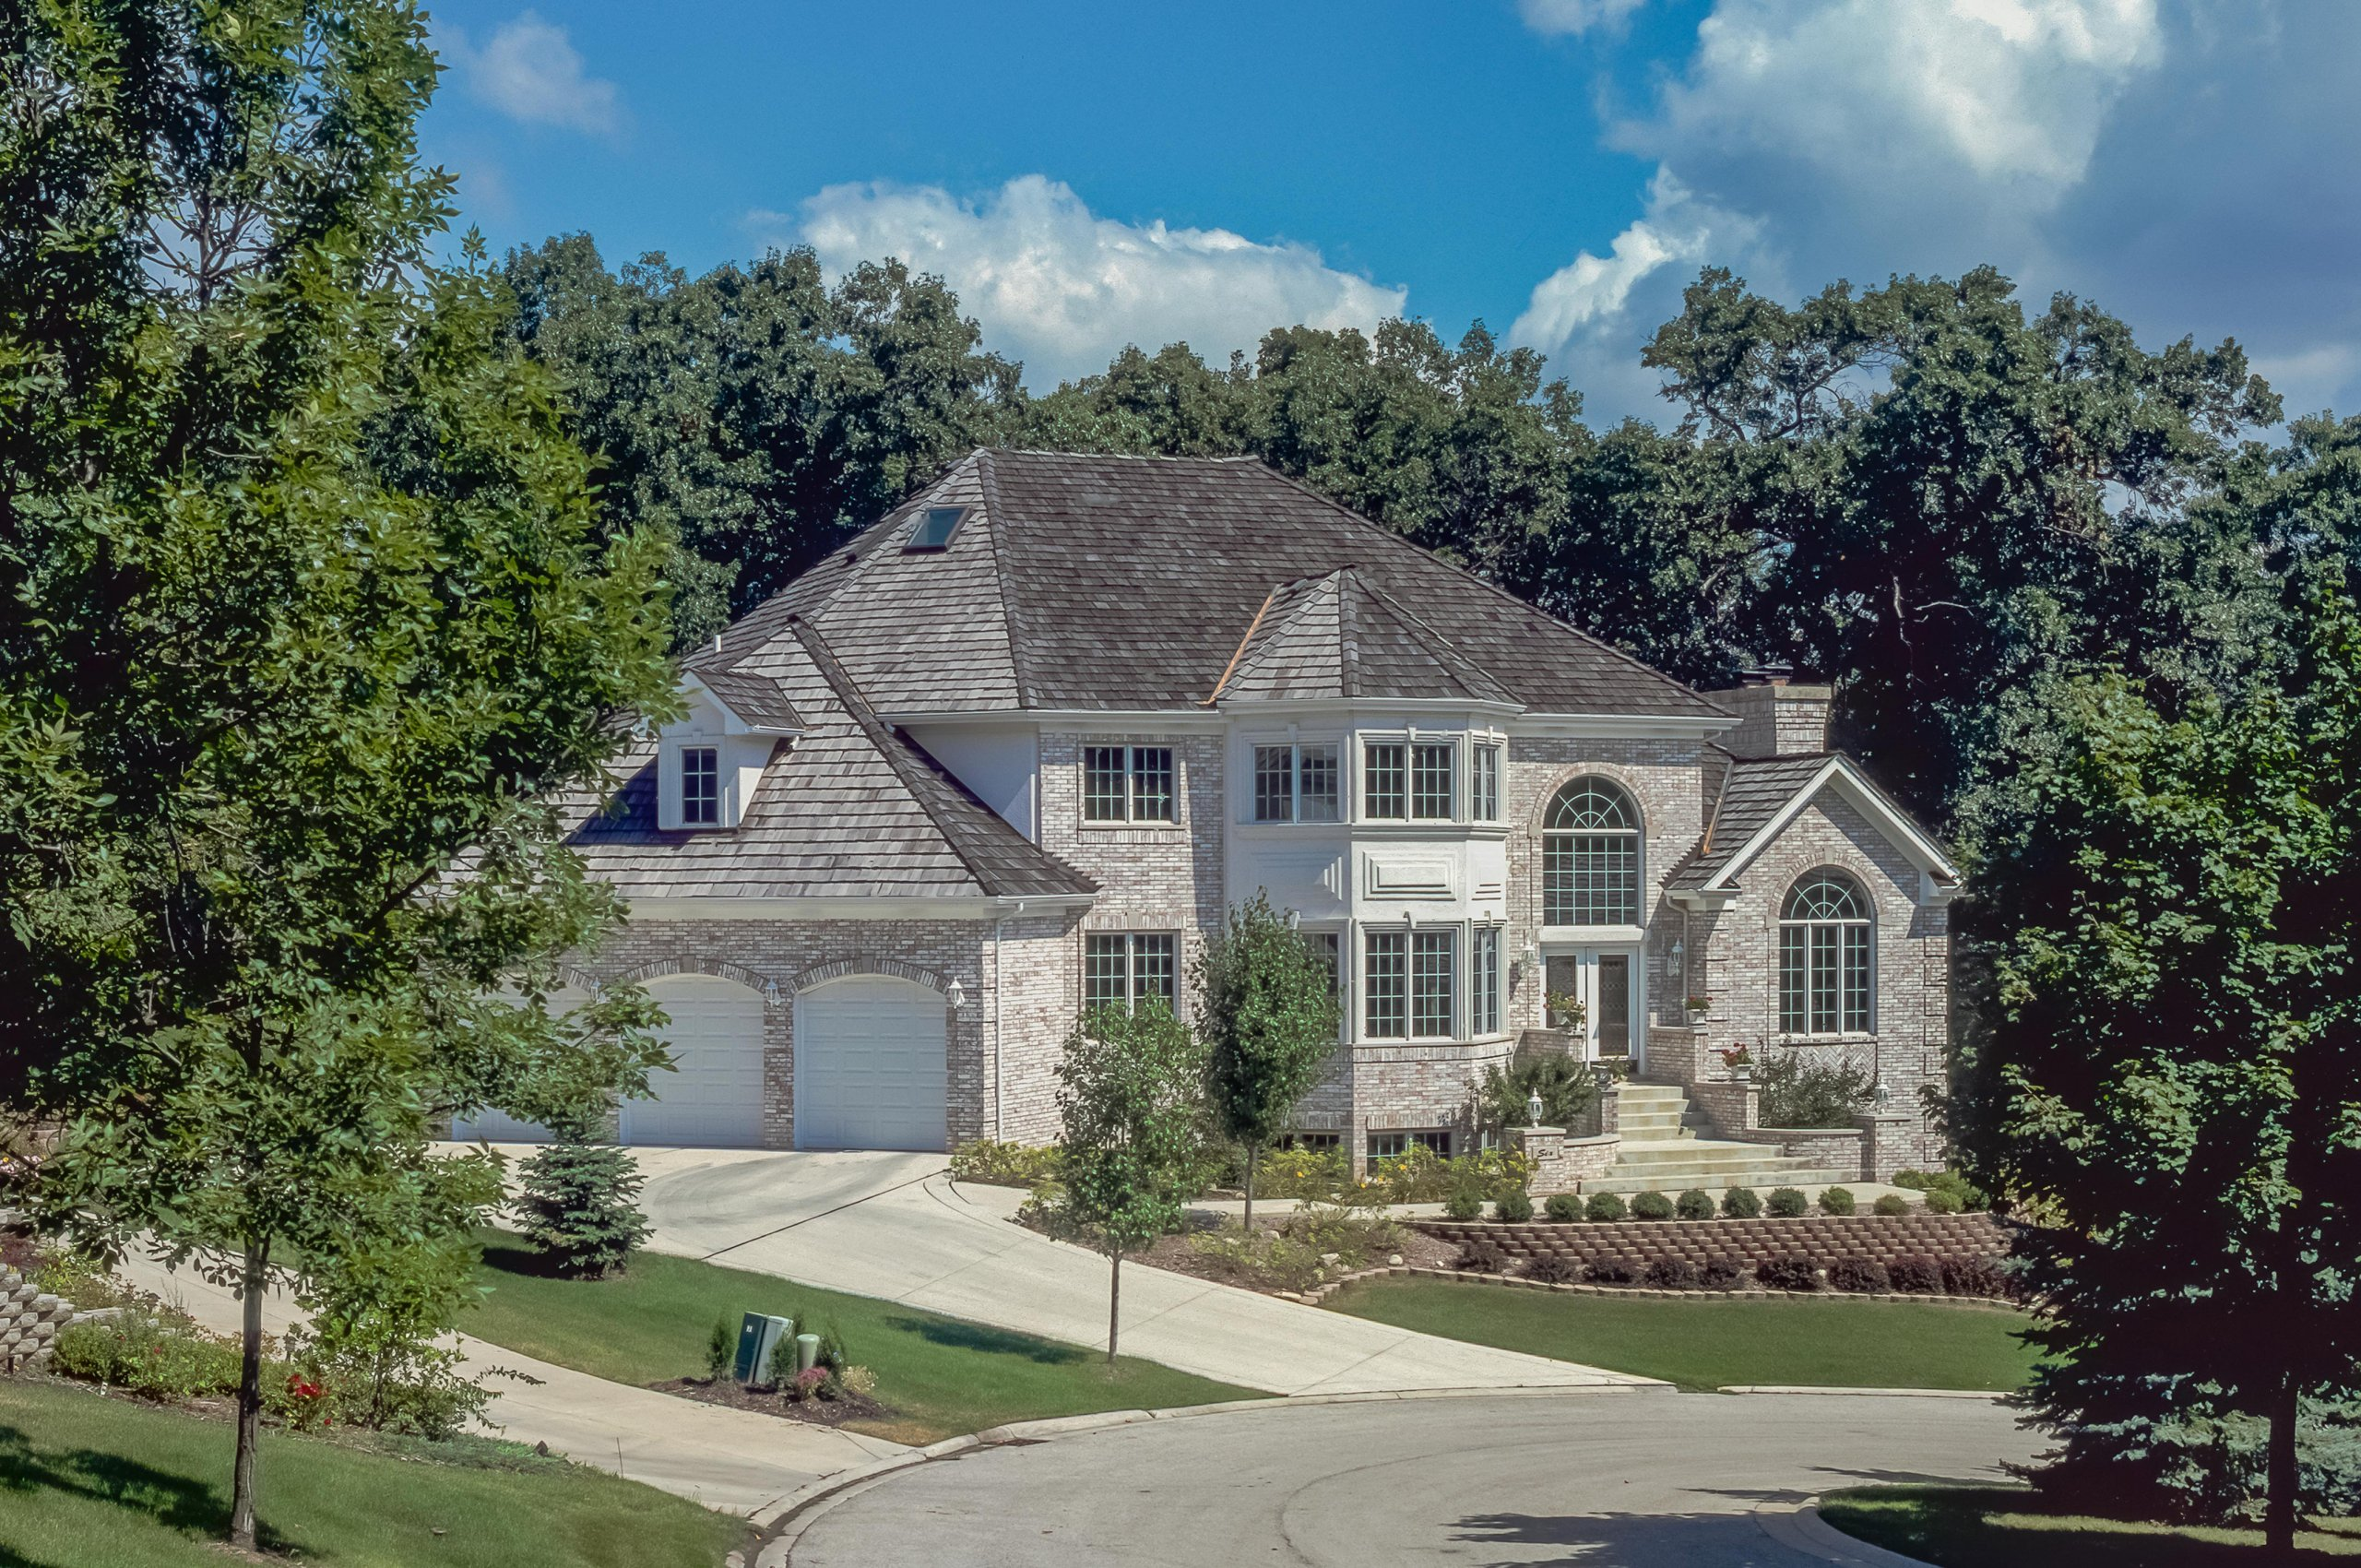 Beautiful white brick 2 story home in Bolingbrook, Illinois.